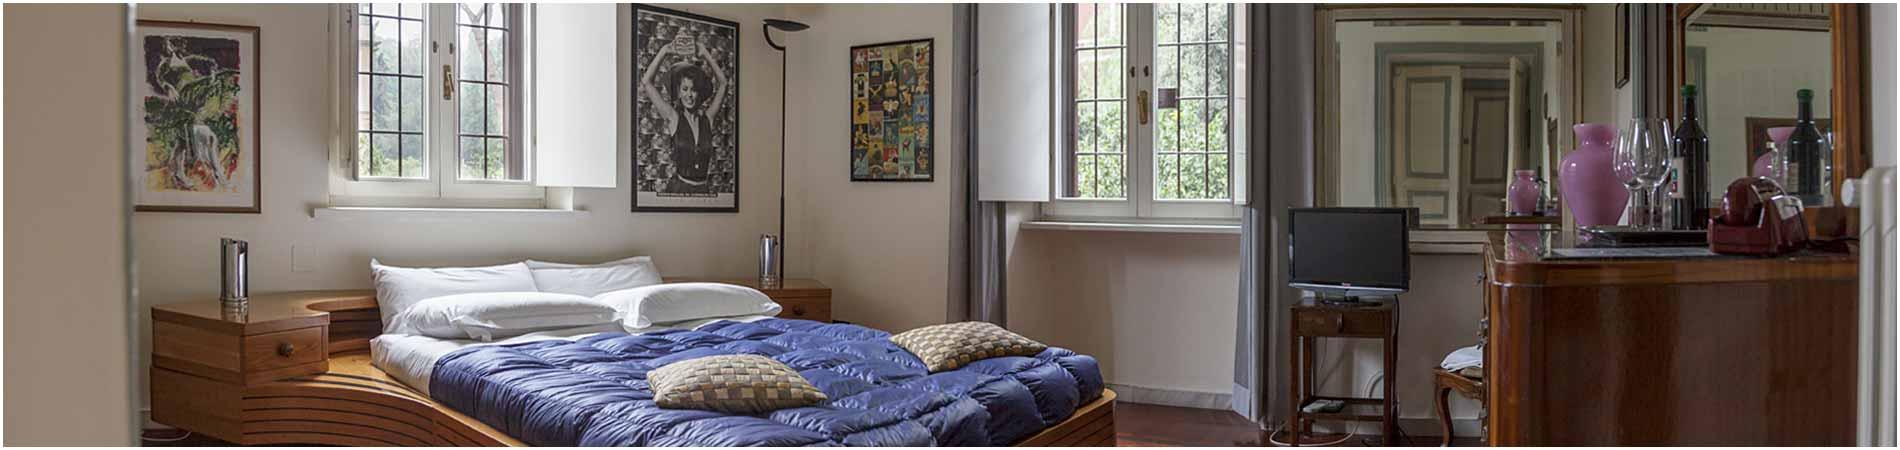 Bed and Breakfast Roma Trastevere